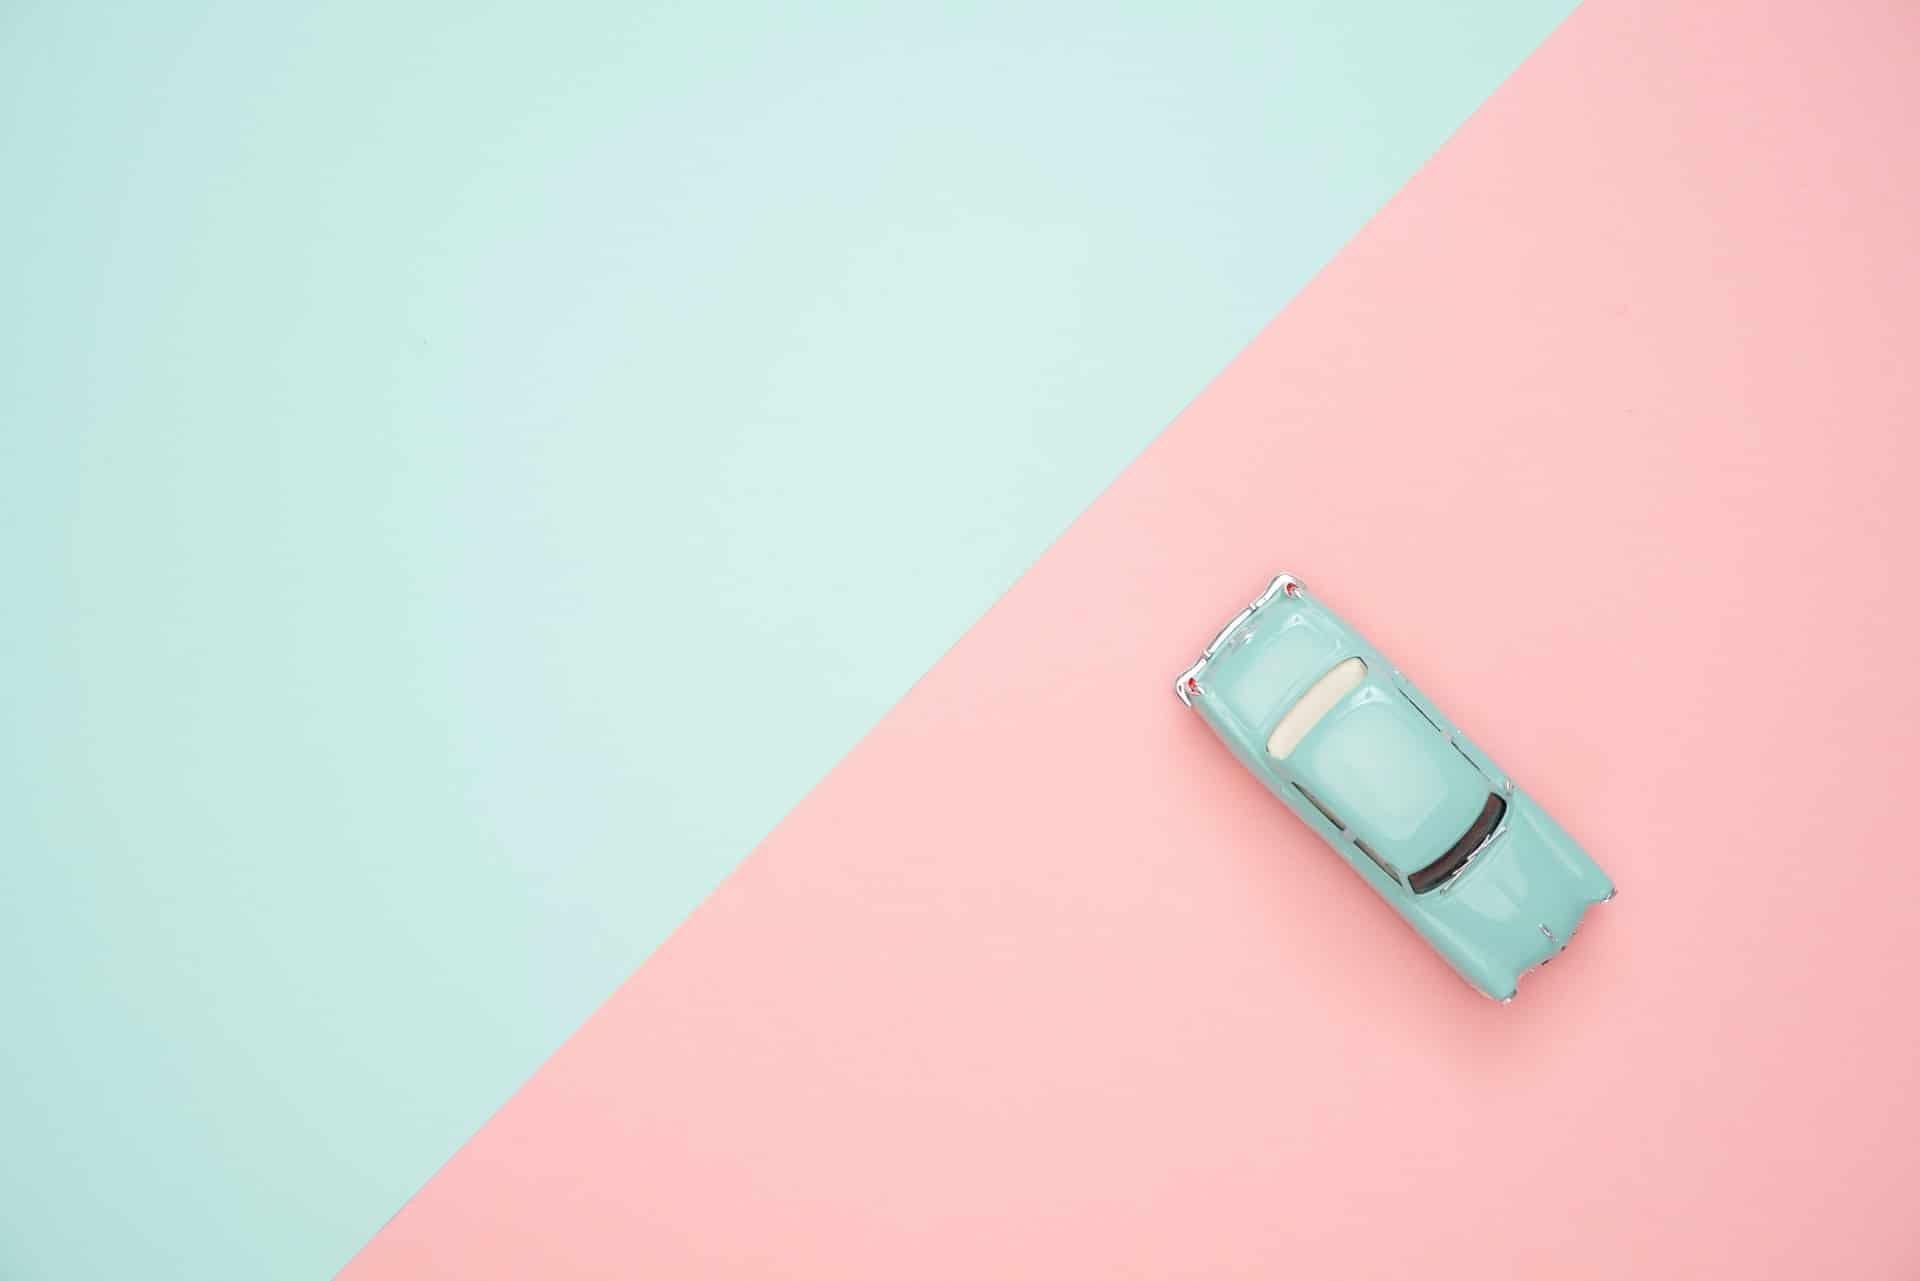 Taxation_of_company_cars